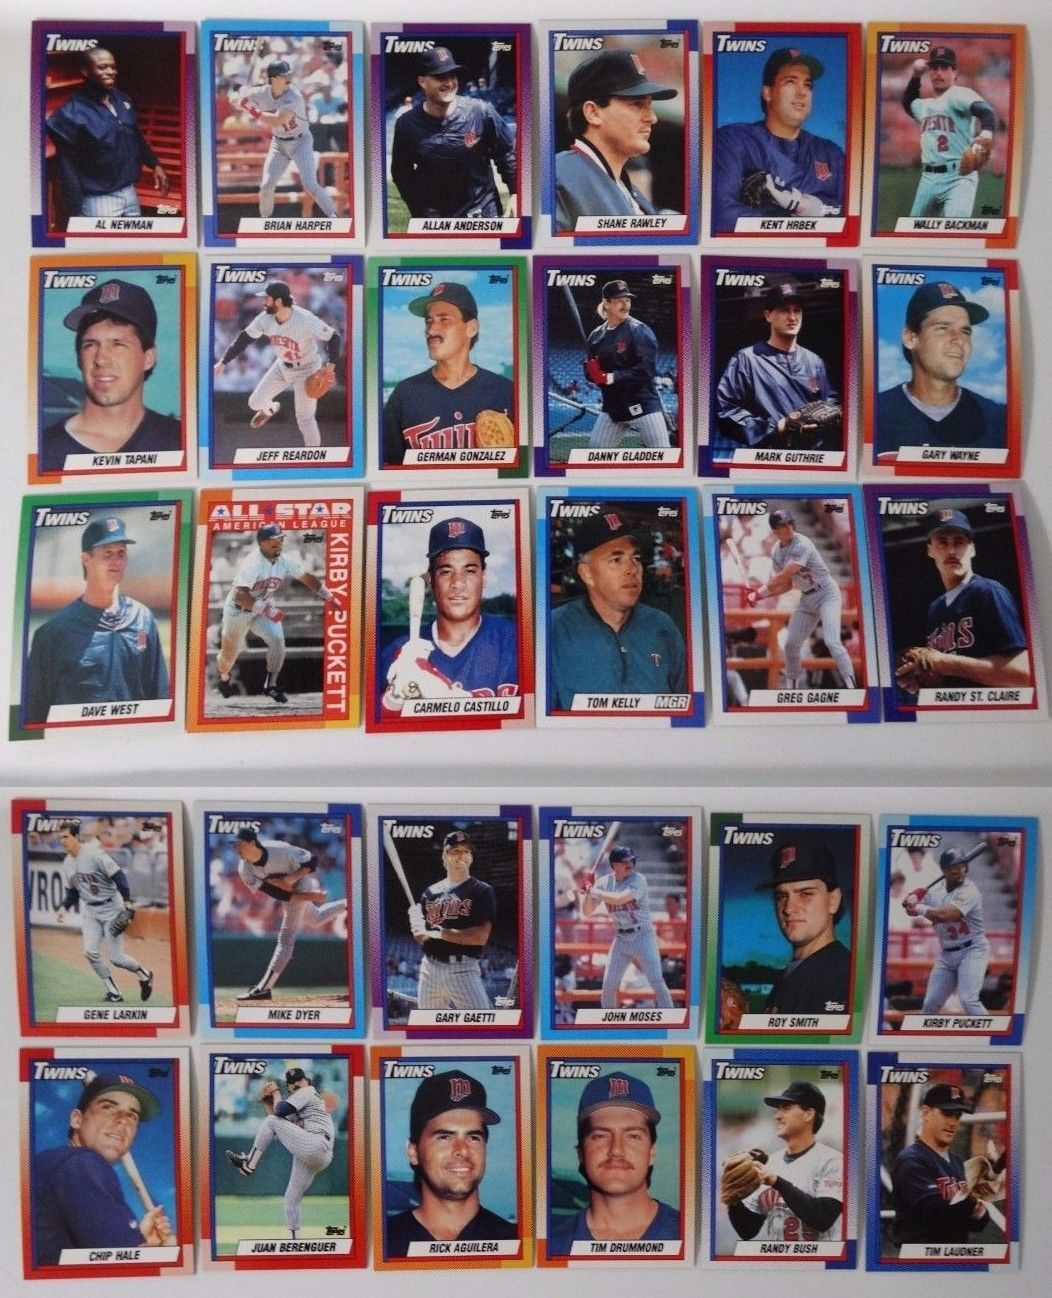 1990 Topps Minnesota Twins Team Set of 30 Baseball Cards